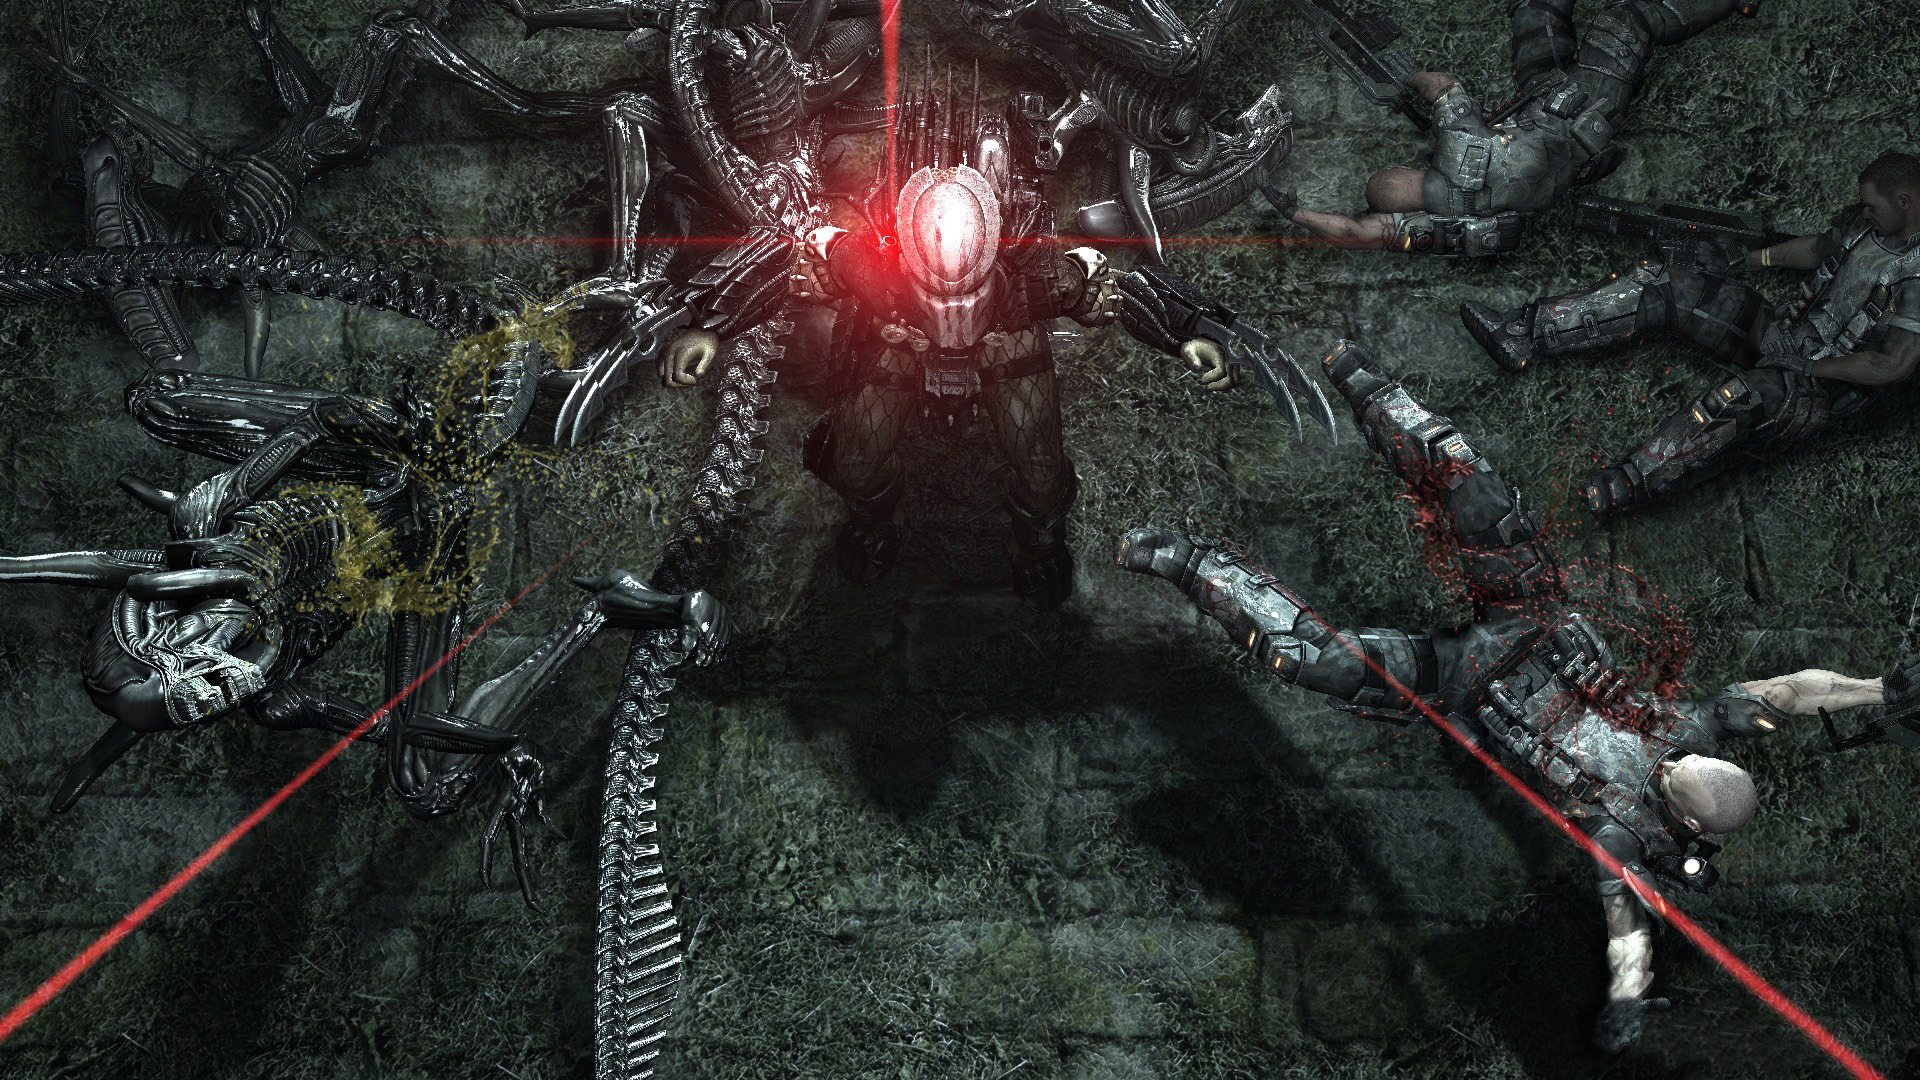 Aliens vs predator full hd wallpaper and background image video game aliens vs predator alien predator battle wallpaper voltagebd Choice Image